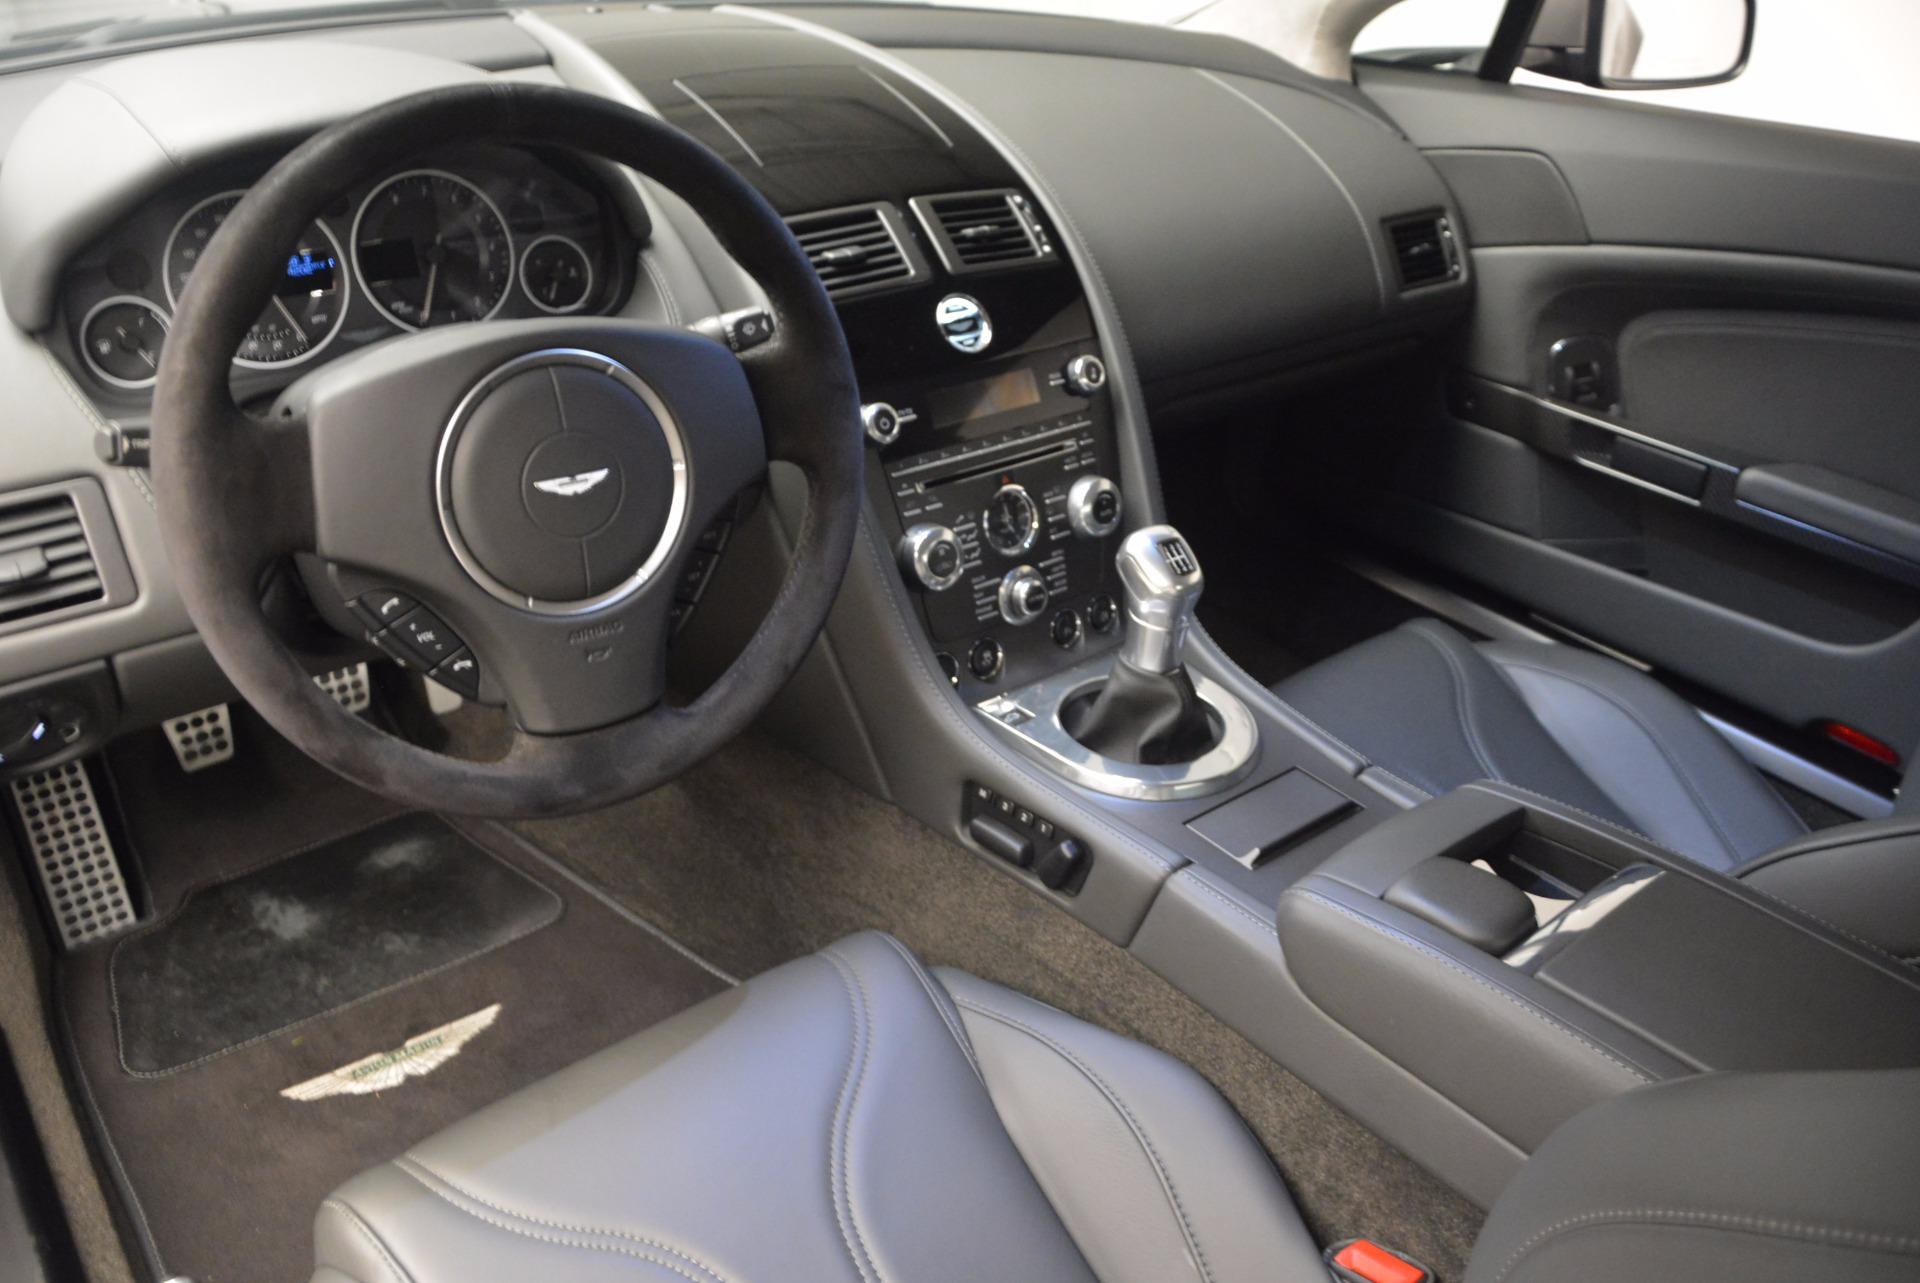 Used 2012 Aston Martin V12 Vantage  For Sale In Greenwich, CT 994_p14